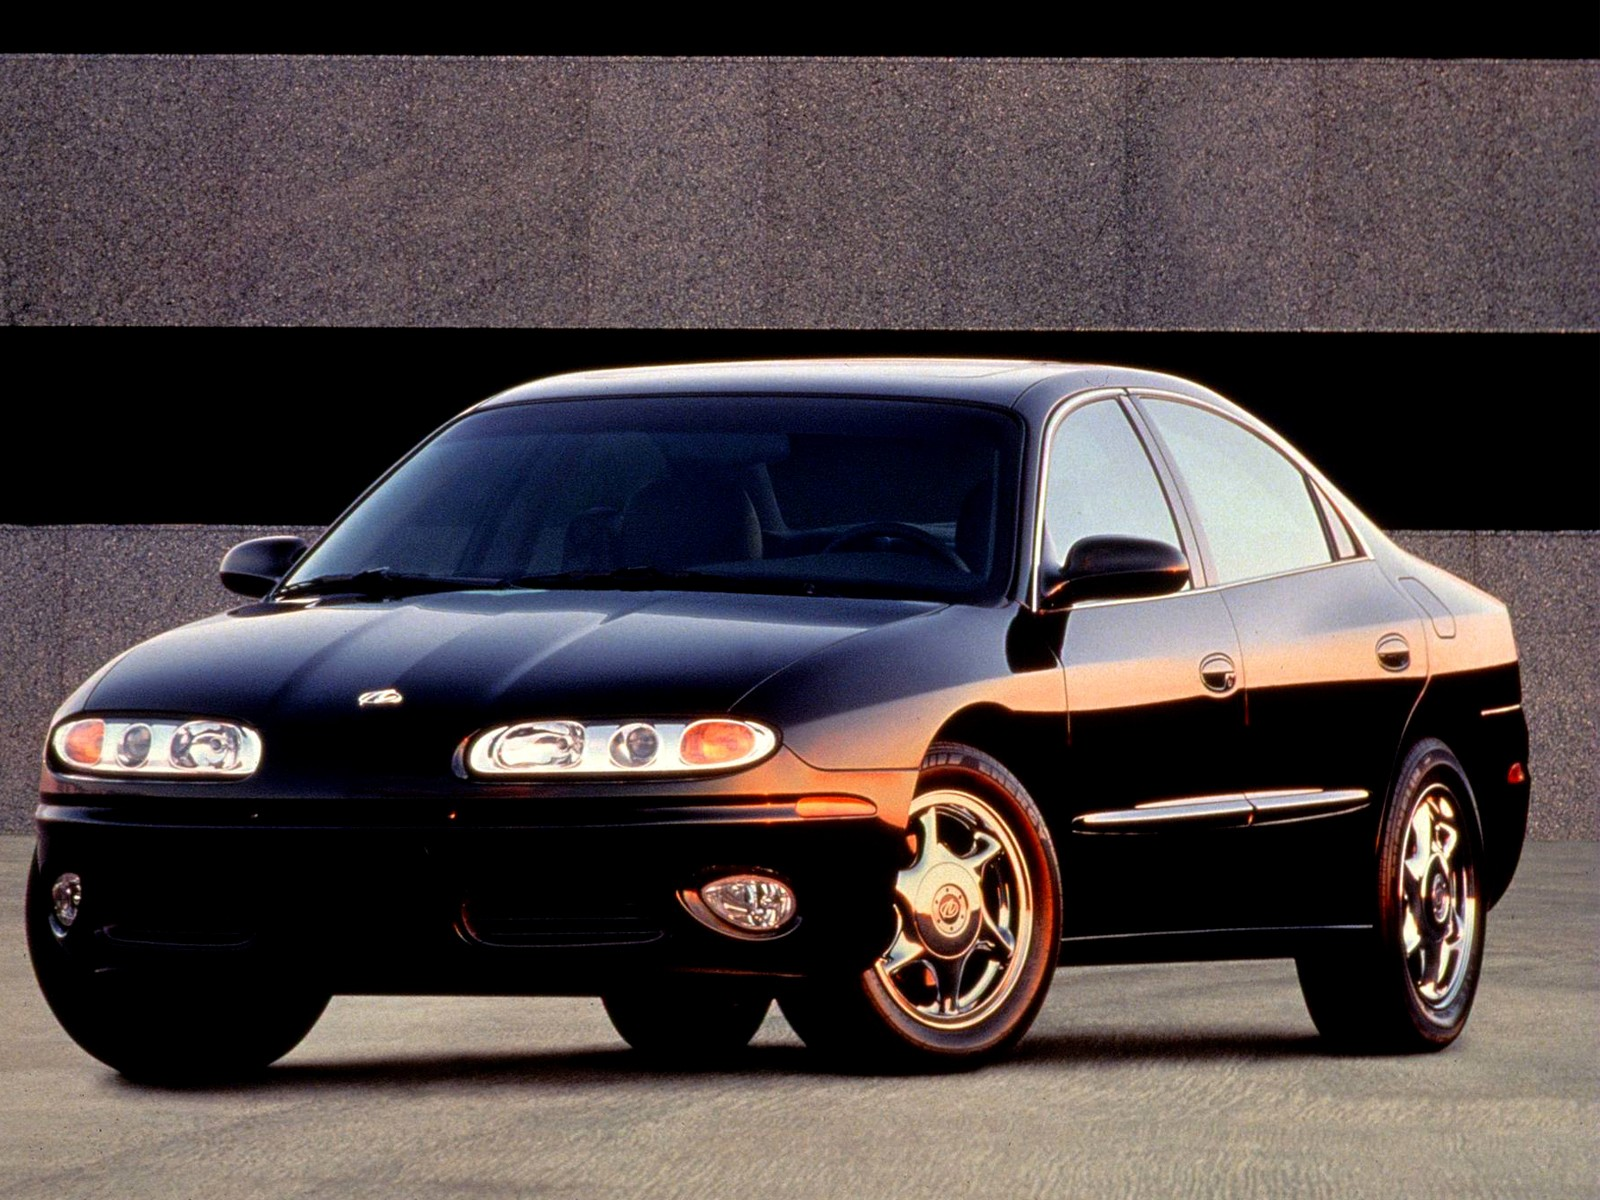 Green Buick Gmc >> OLDSMOBILE Aurora - 2000, 2001, 2002, 2003 - autoevolution